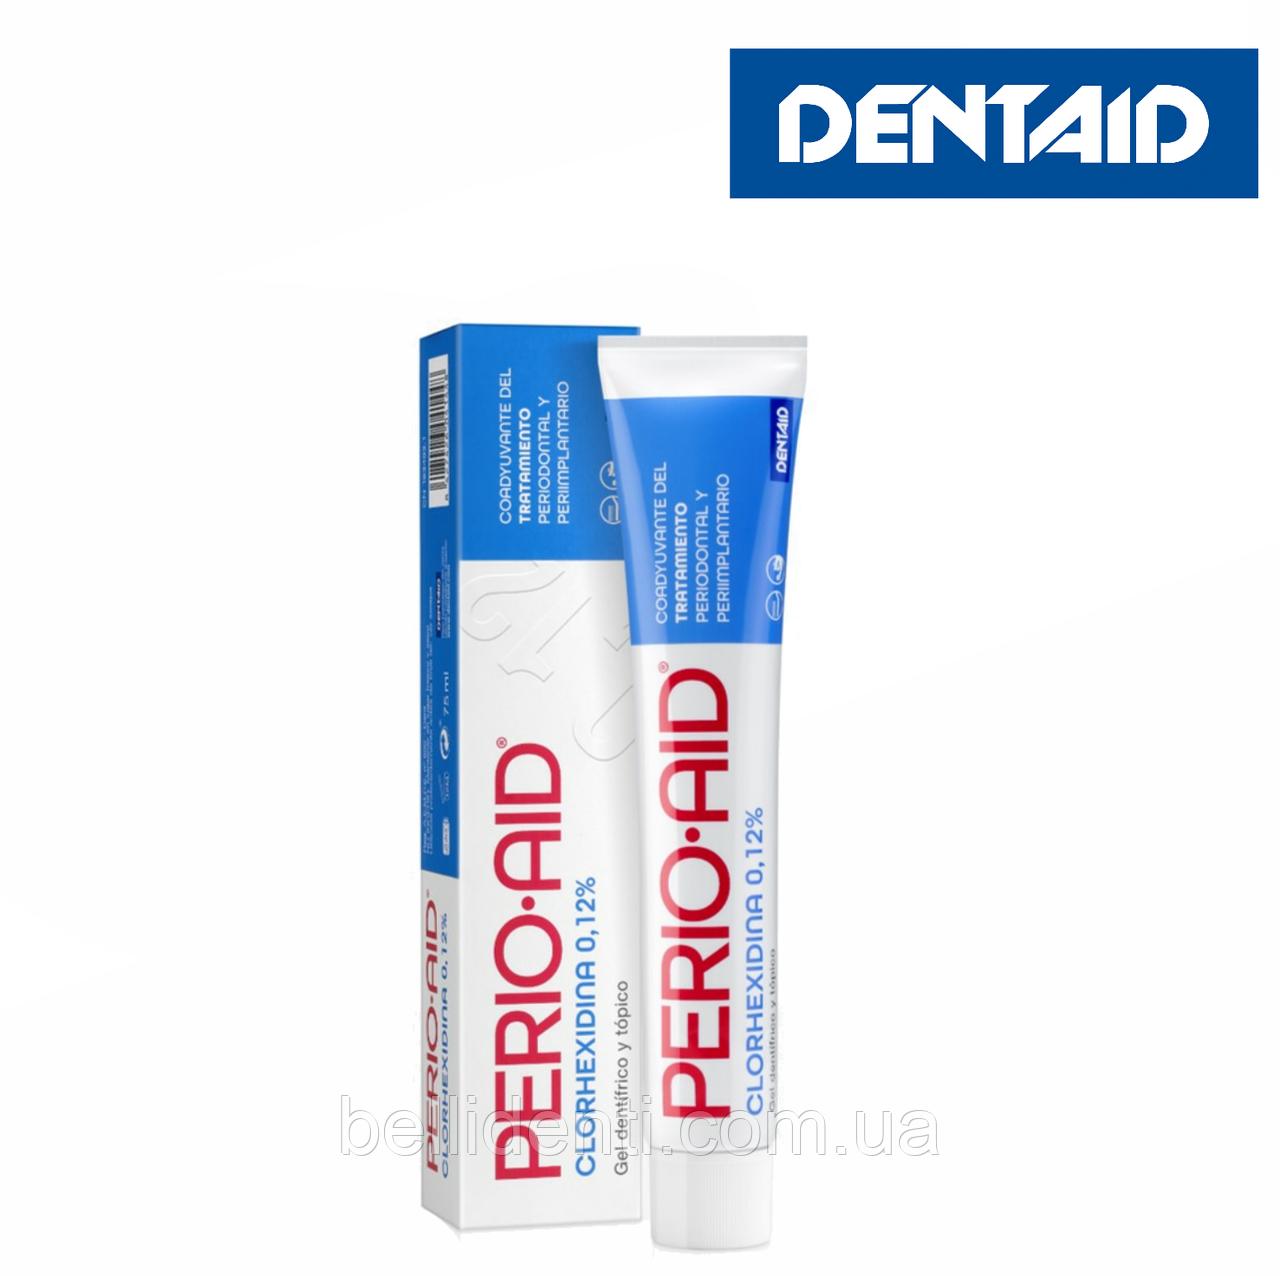 PERIO-AID 0.12% INTENSIVE CARE гель-паста, сильный антисептик, 75 мл